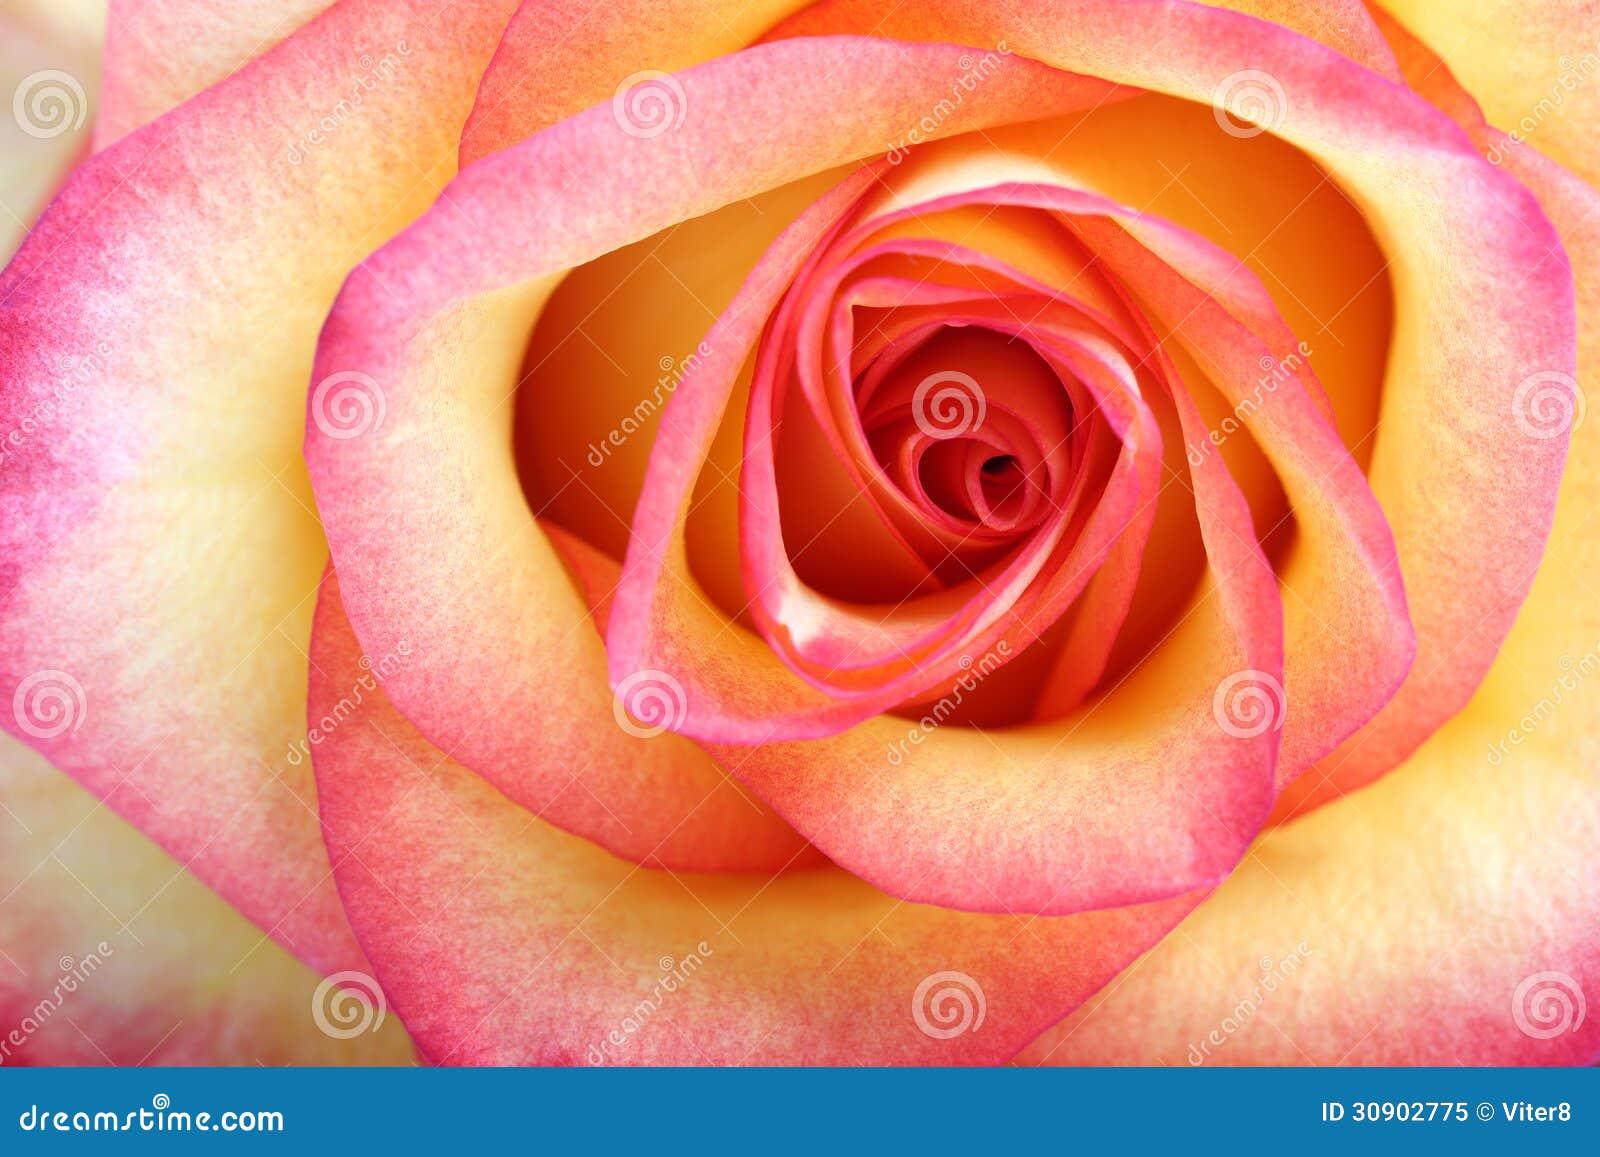 Orange rose. Macro